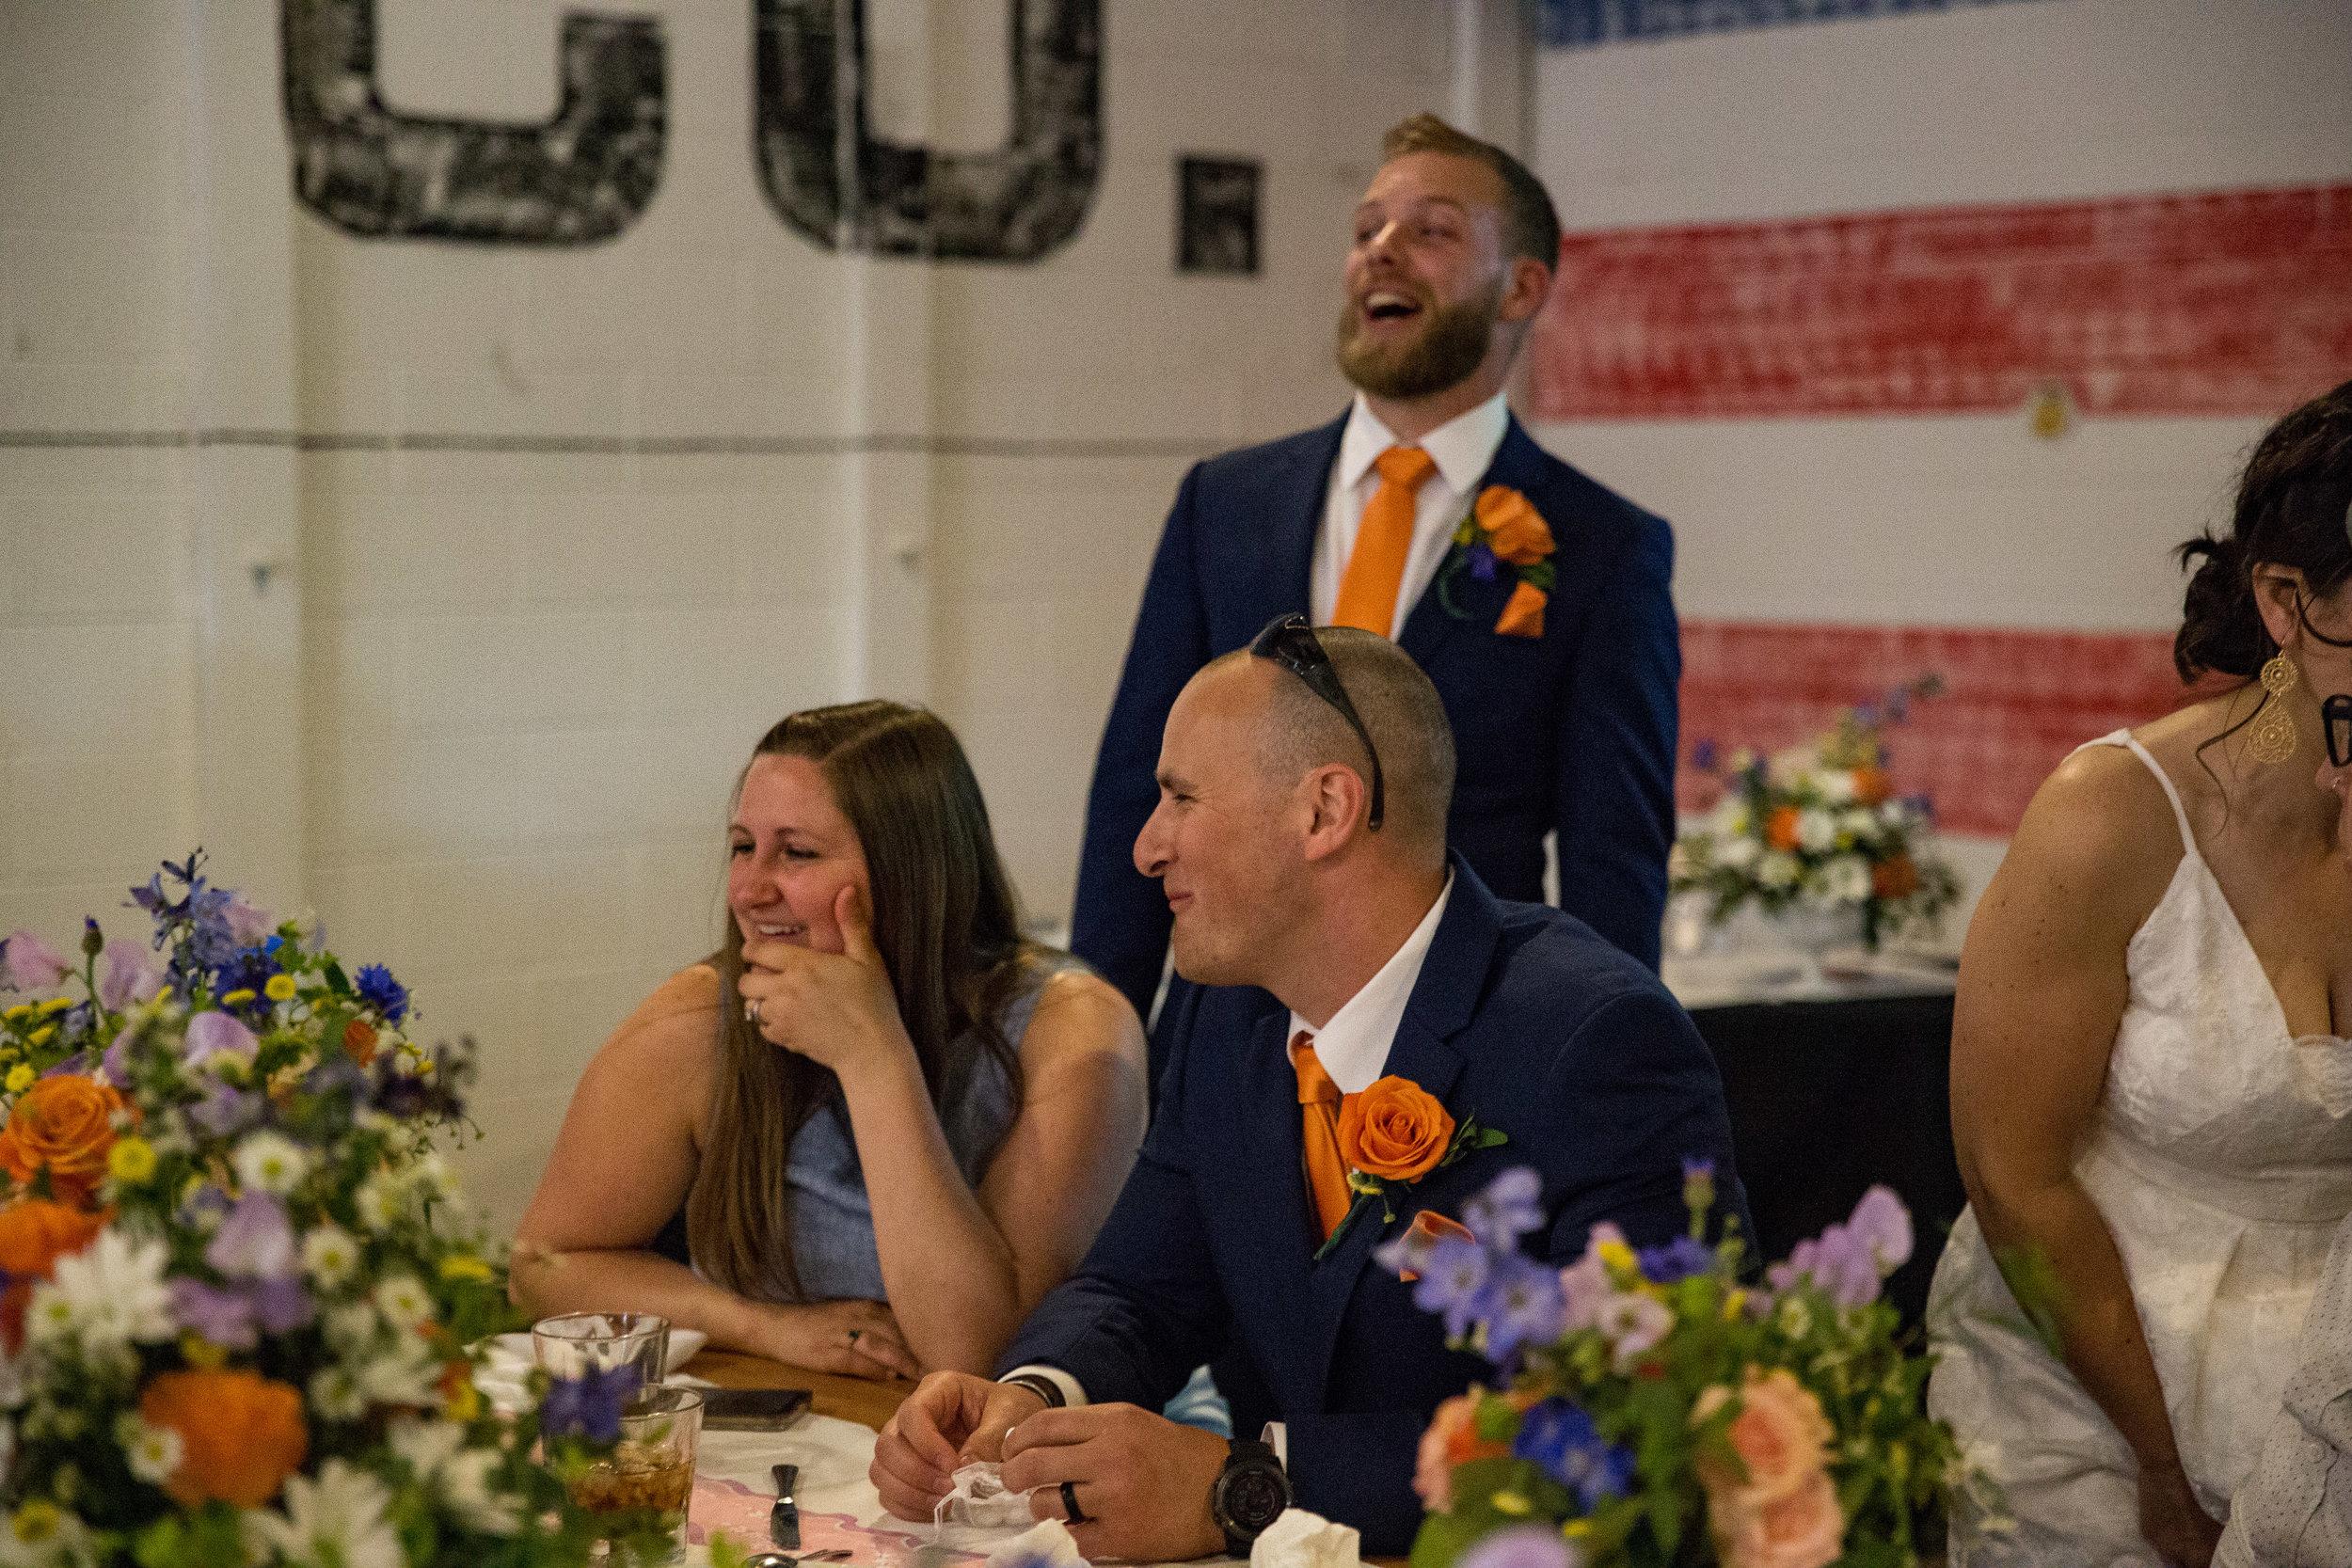 Natalie and Dallas Mooney Wedding 6-8-19_Tania Watt Photography-522.jpg